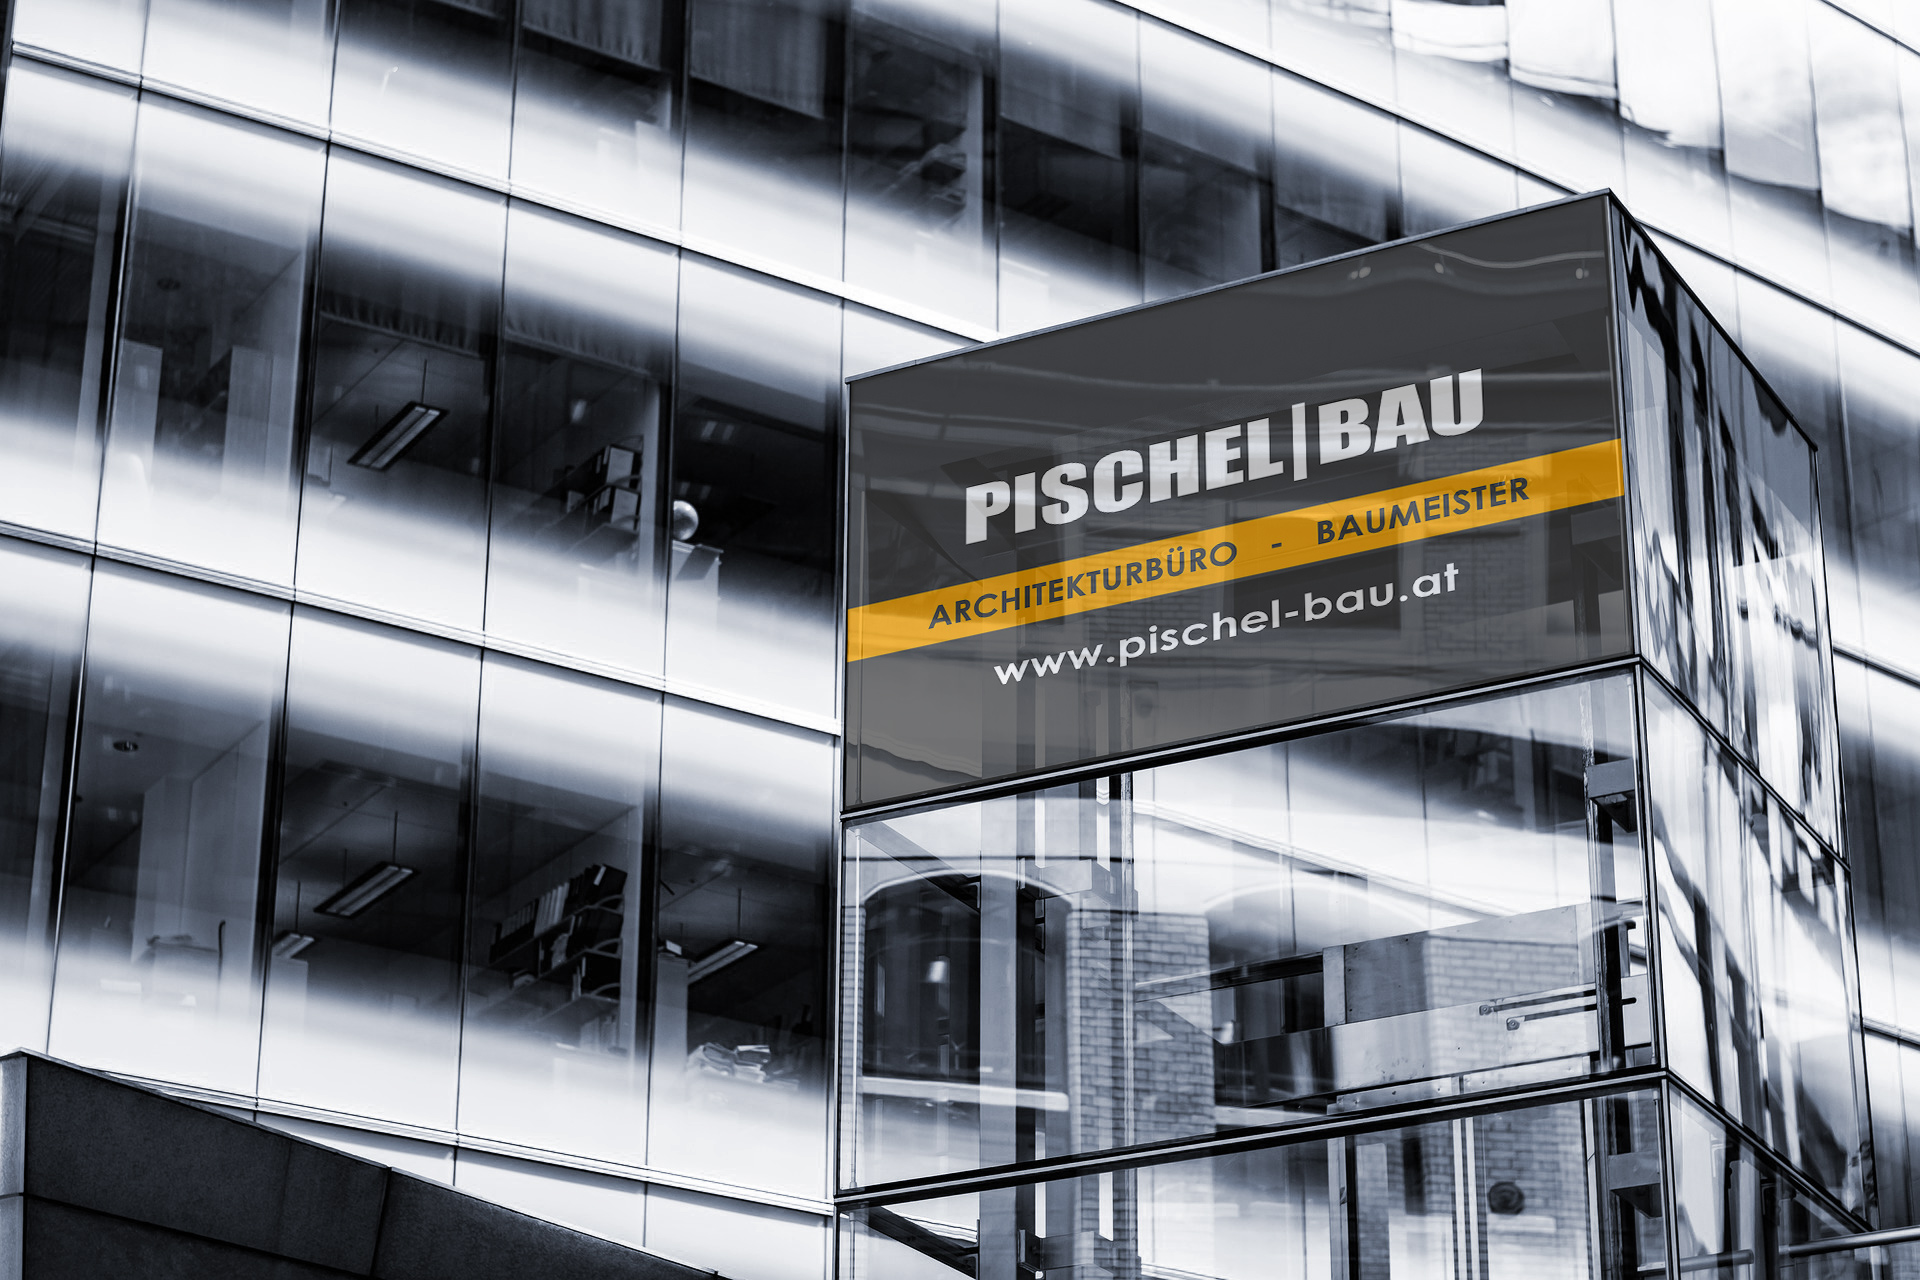 Markus Pischel Bau